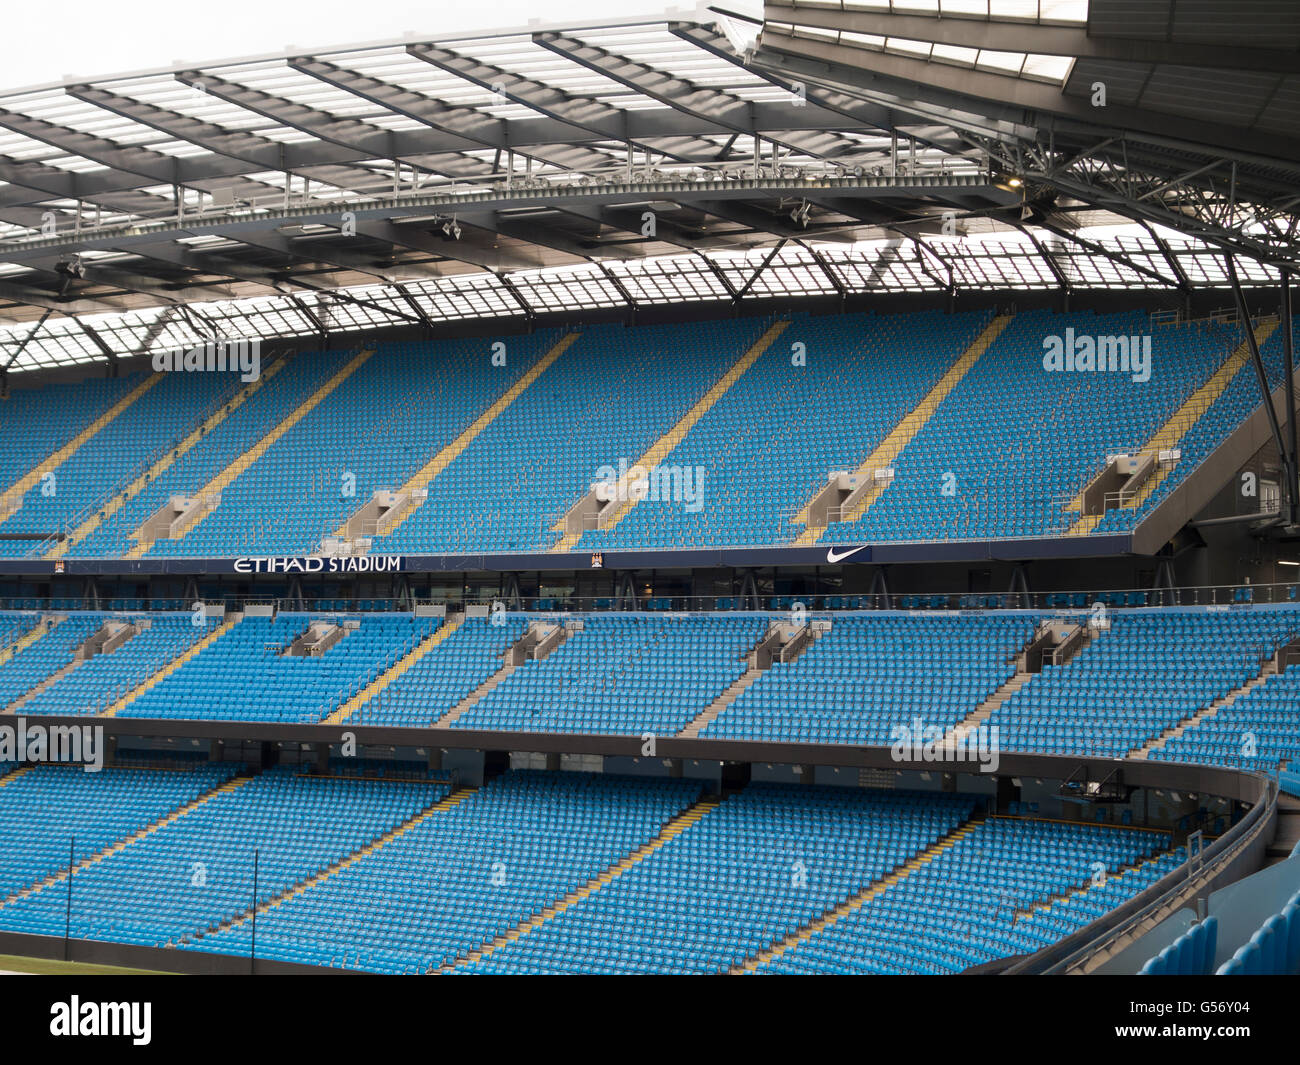 Seats inside Etihad Stadium Manchester CIty Football Club UK Stock Photo